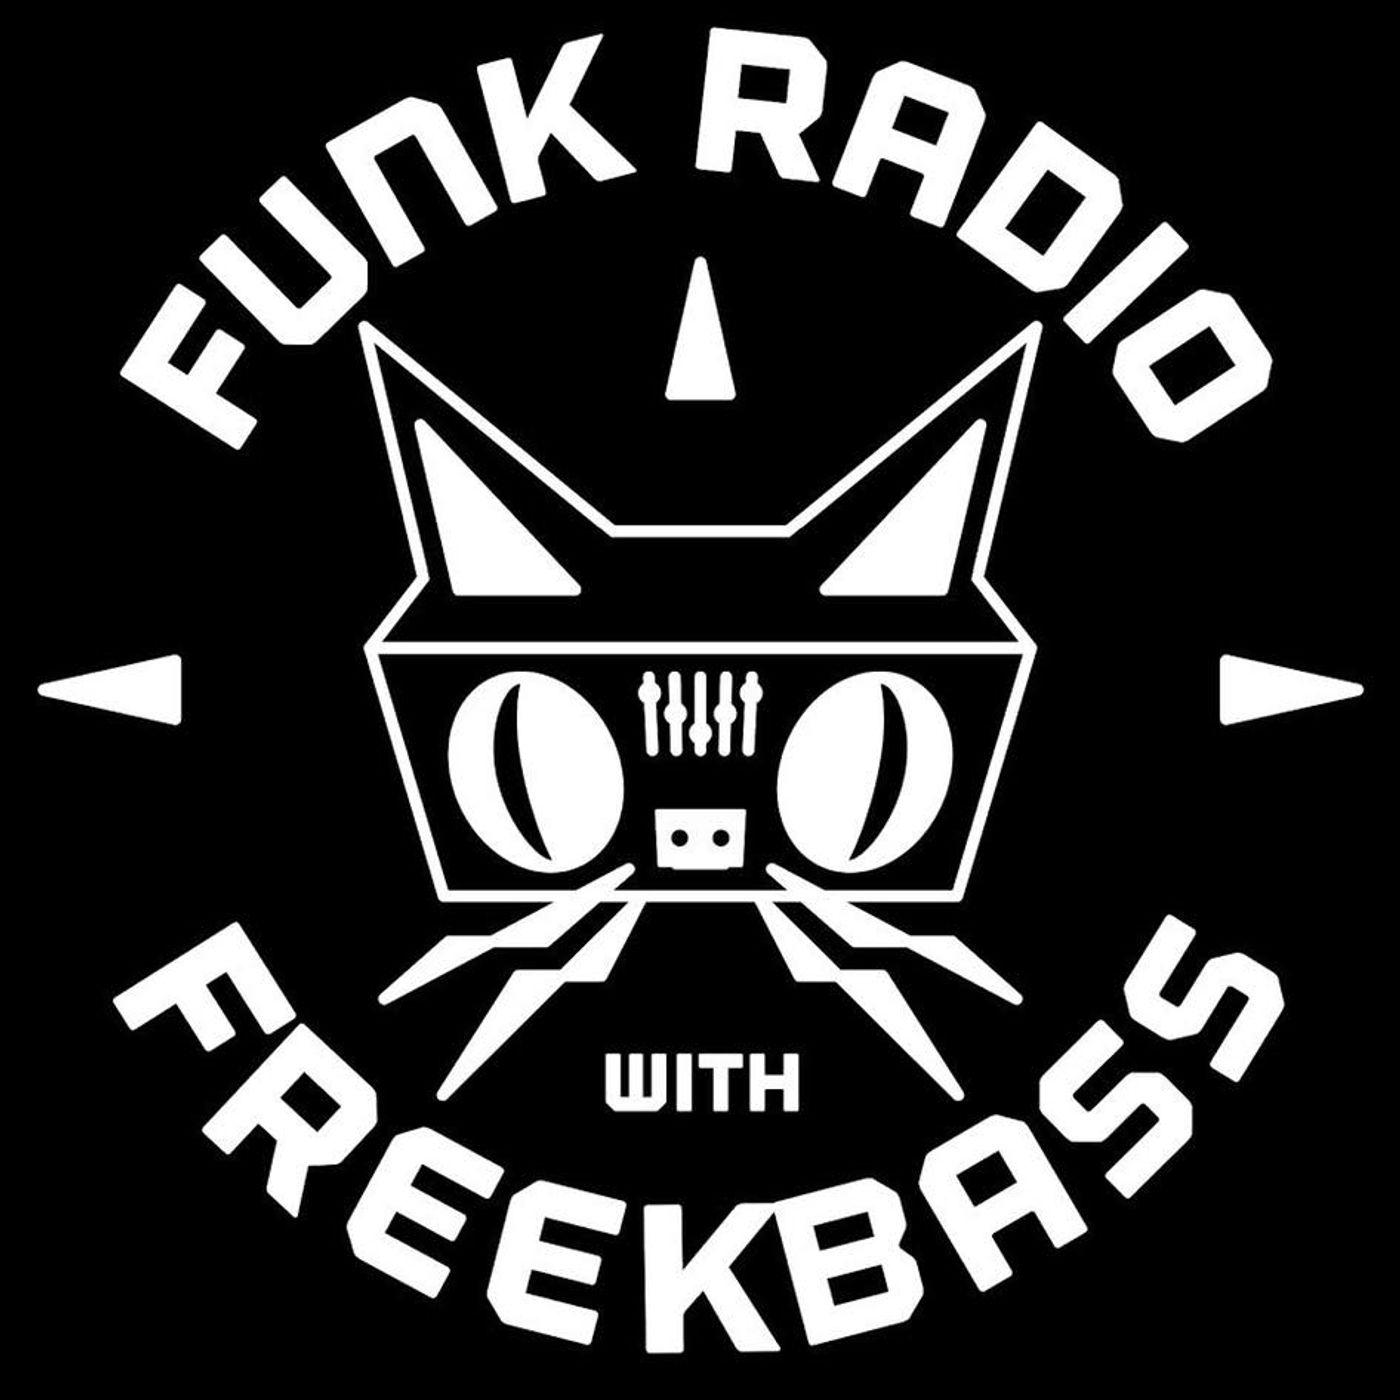 FunkRadioWithFreekbass__SEPTEMBER_10_2021